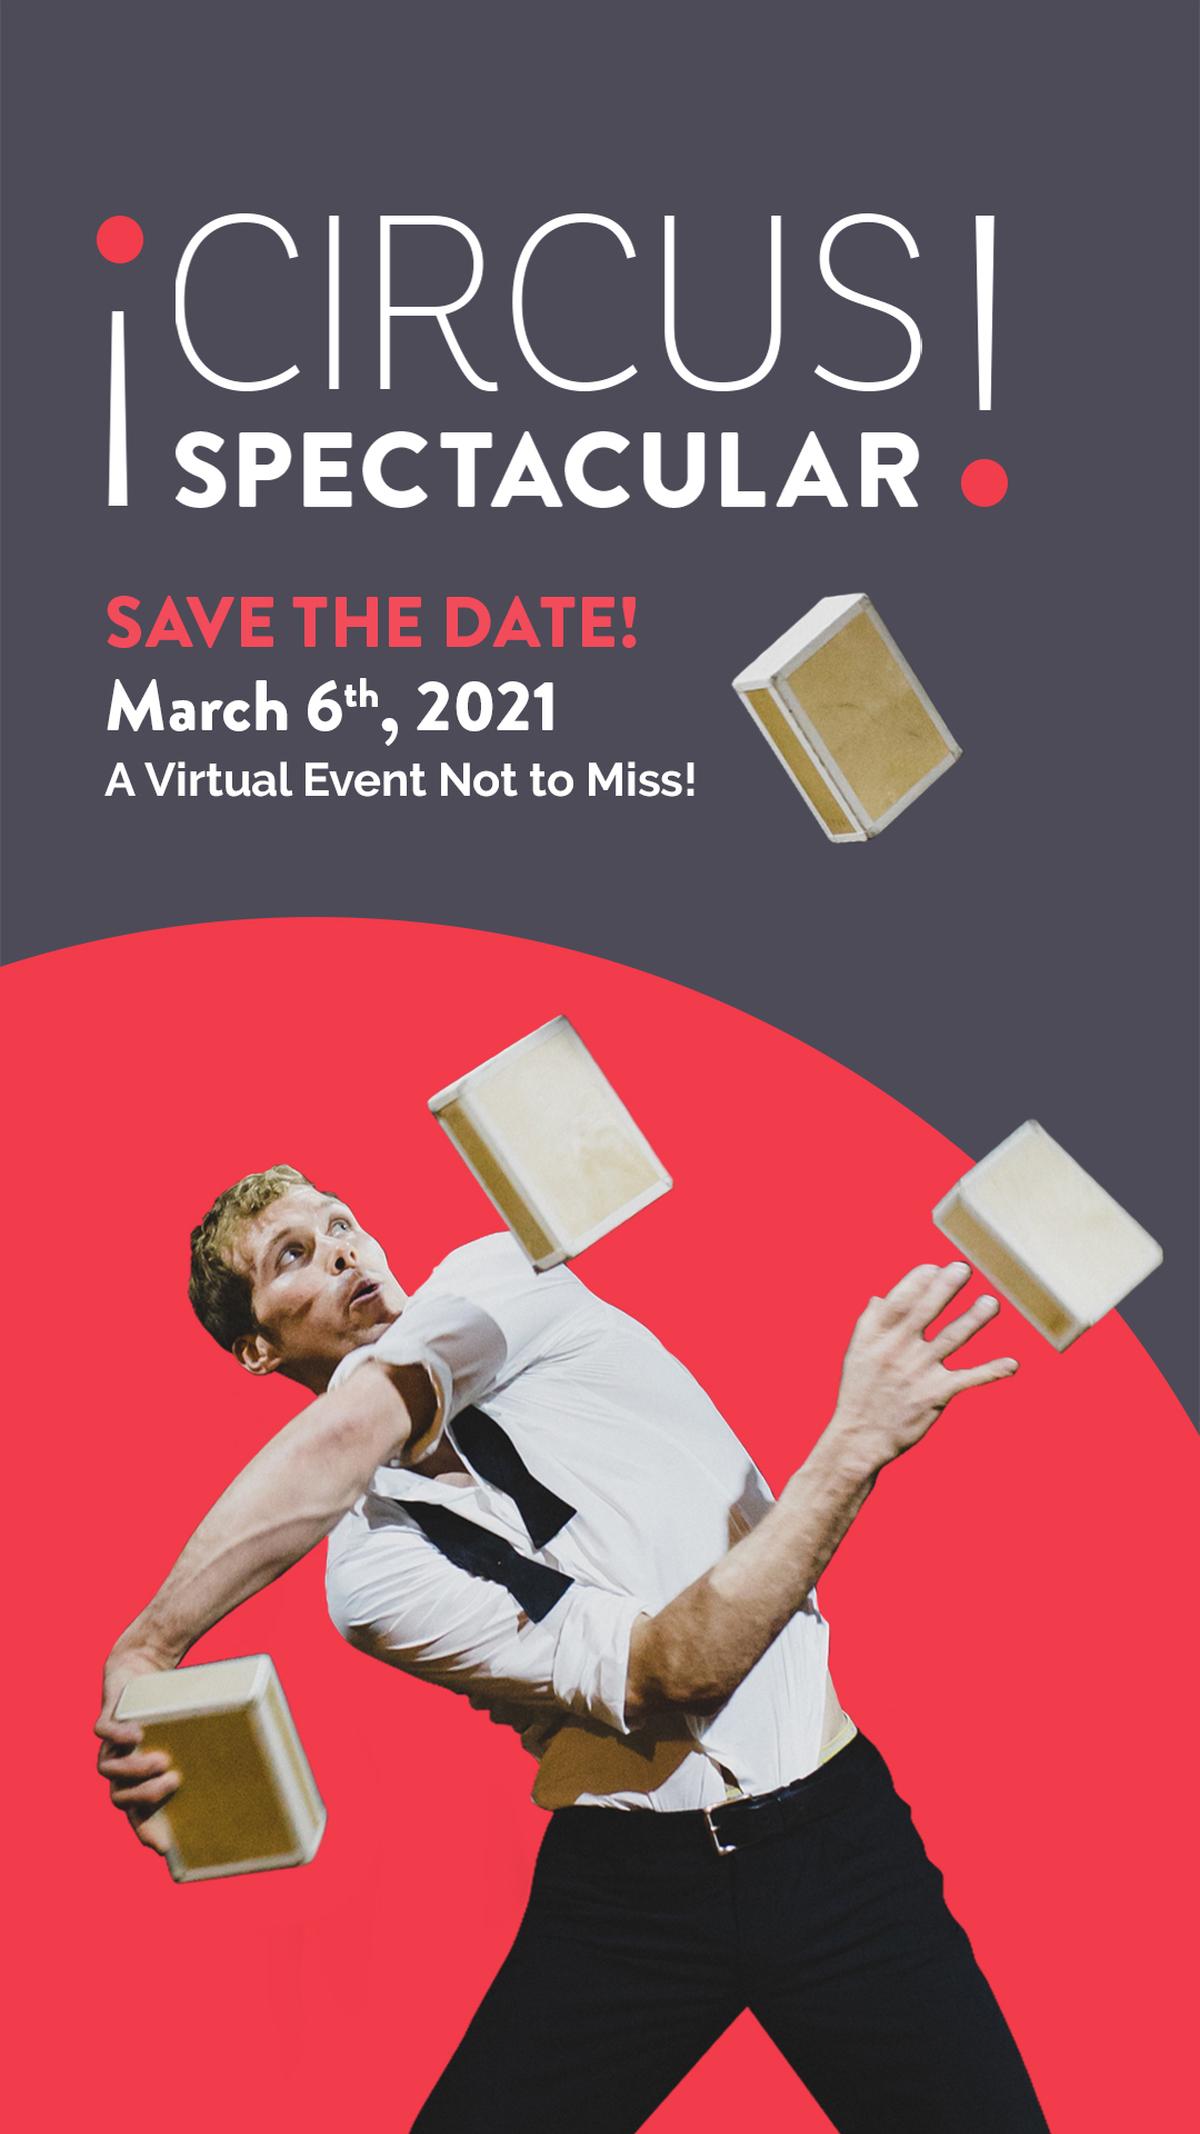 Circus Spectacular - Circus Events - CircusTalk